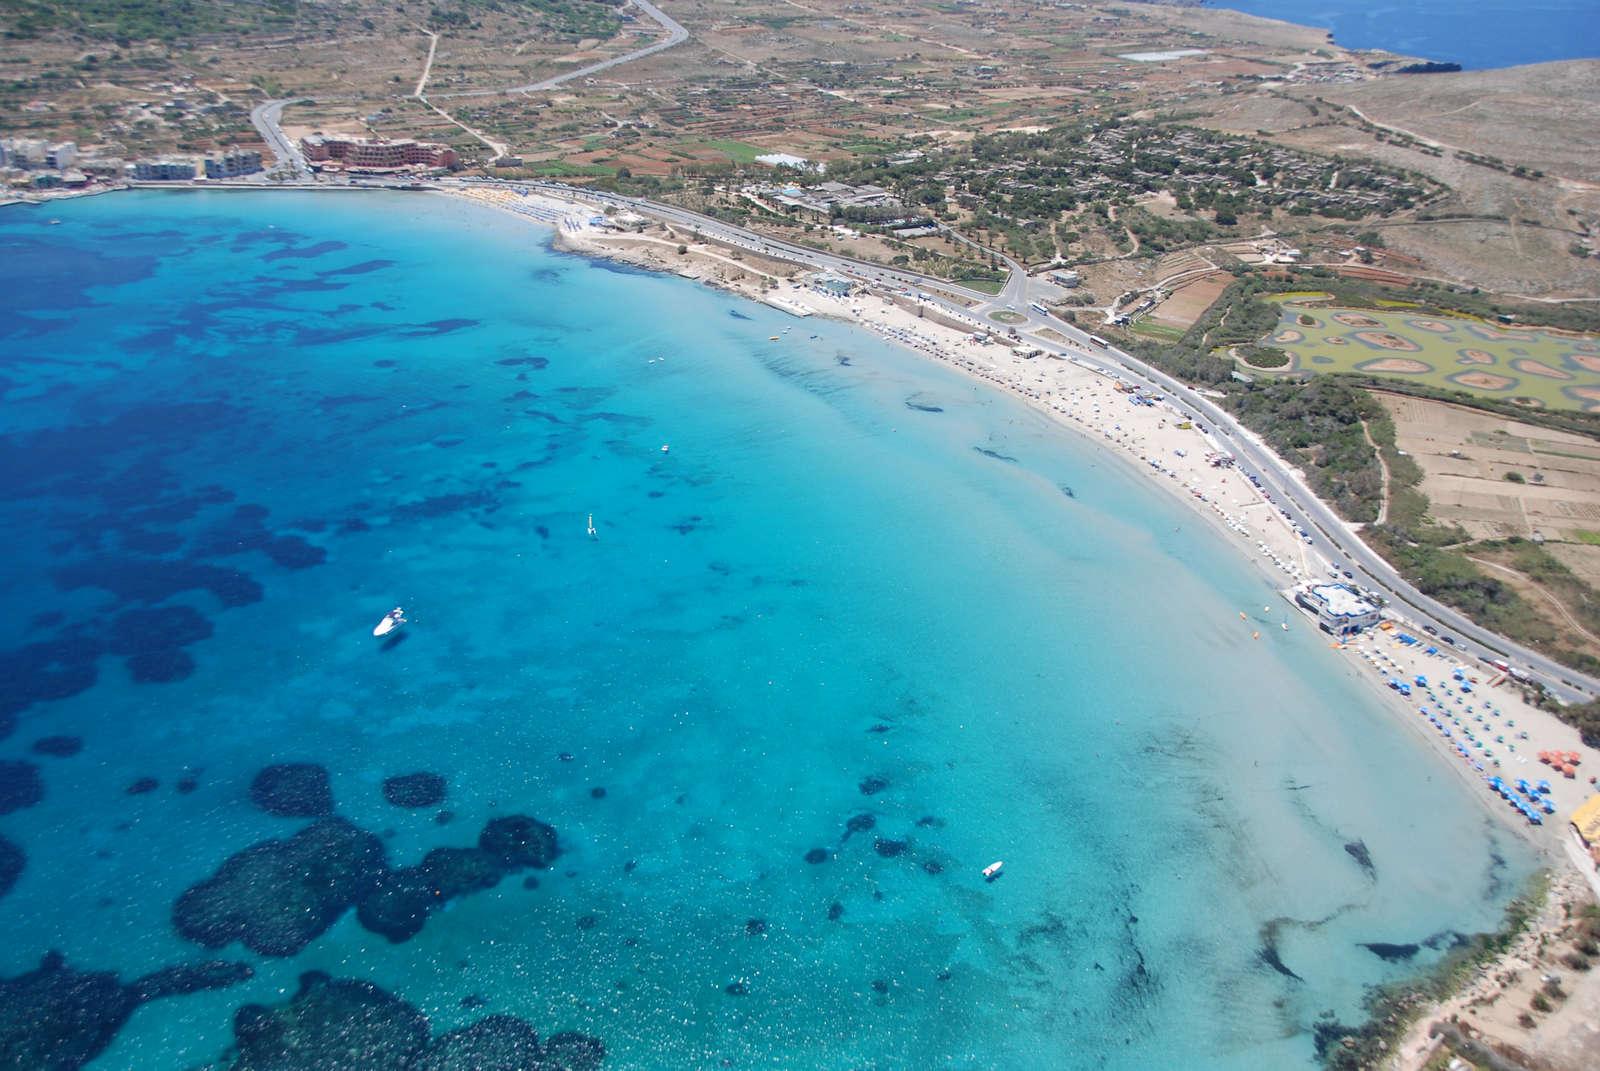 Ghadira Bay - vista aerea